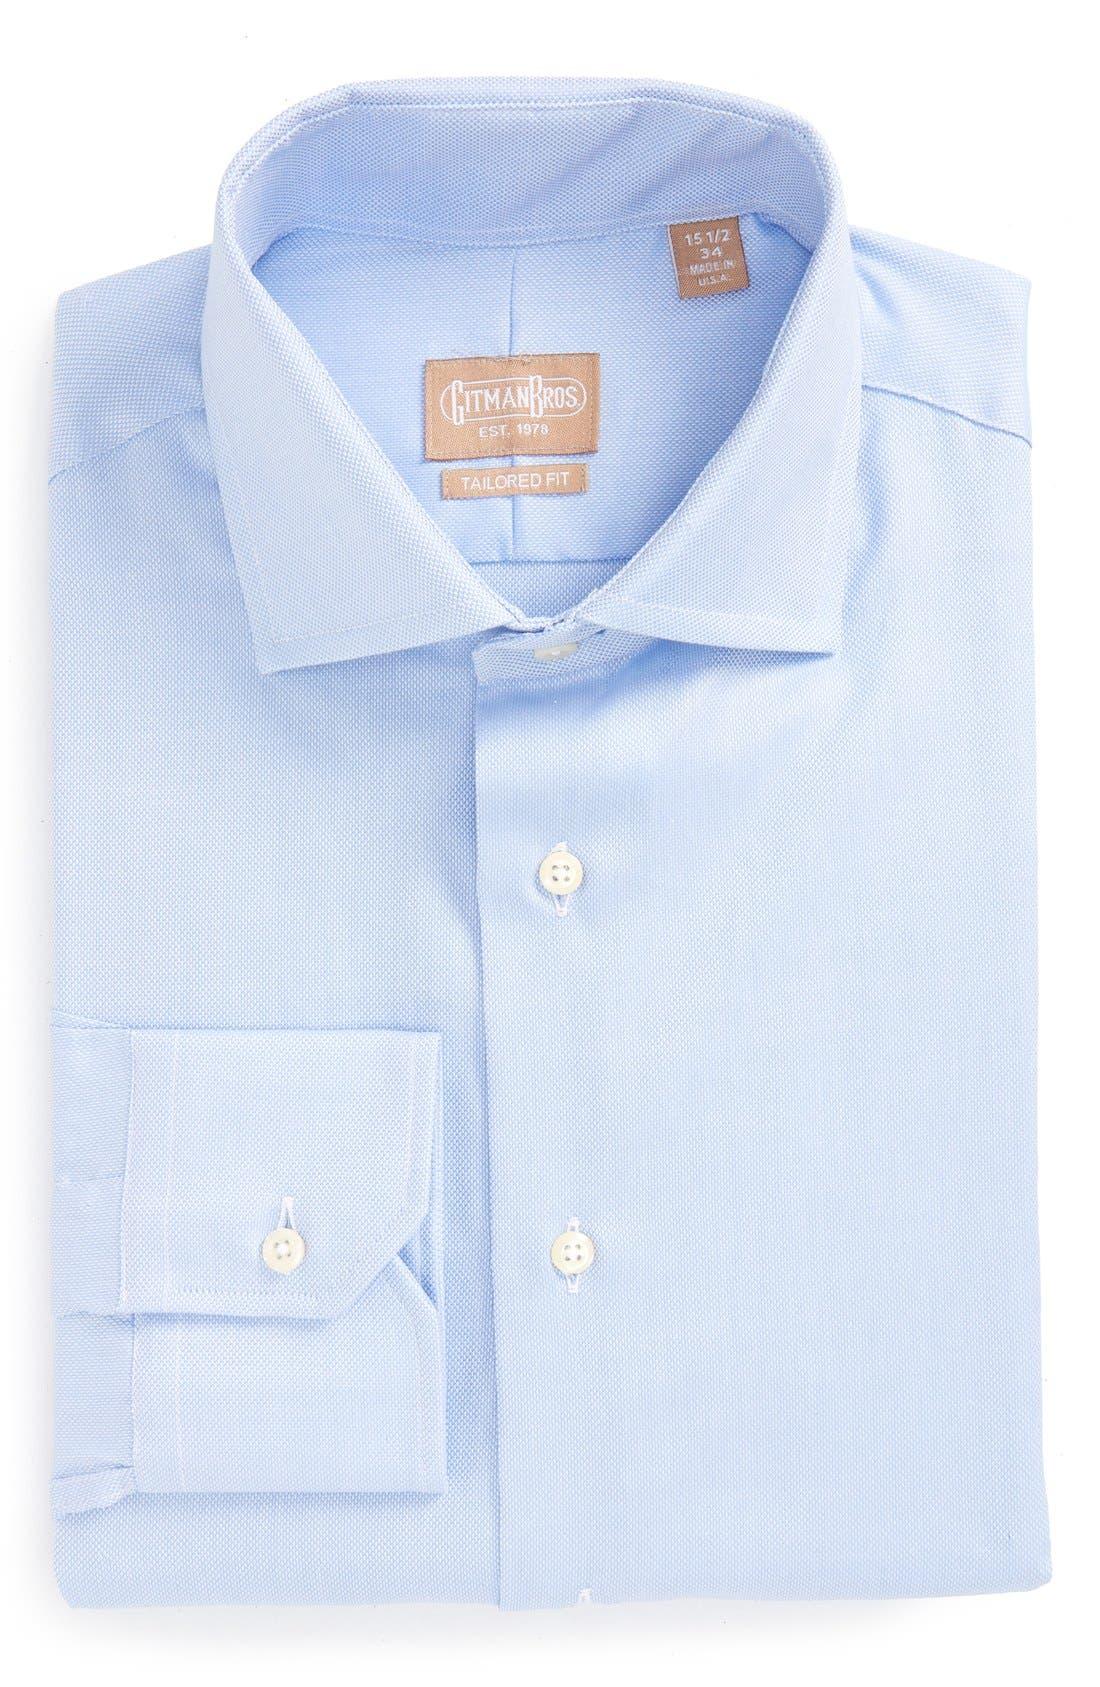 Alternate Image 1 Selected - Gitman Royal Oxford Tailored Fit Dress Shirt